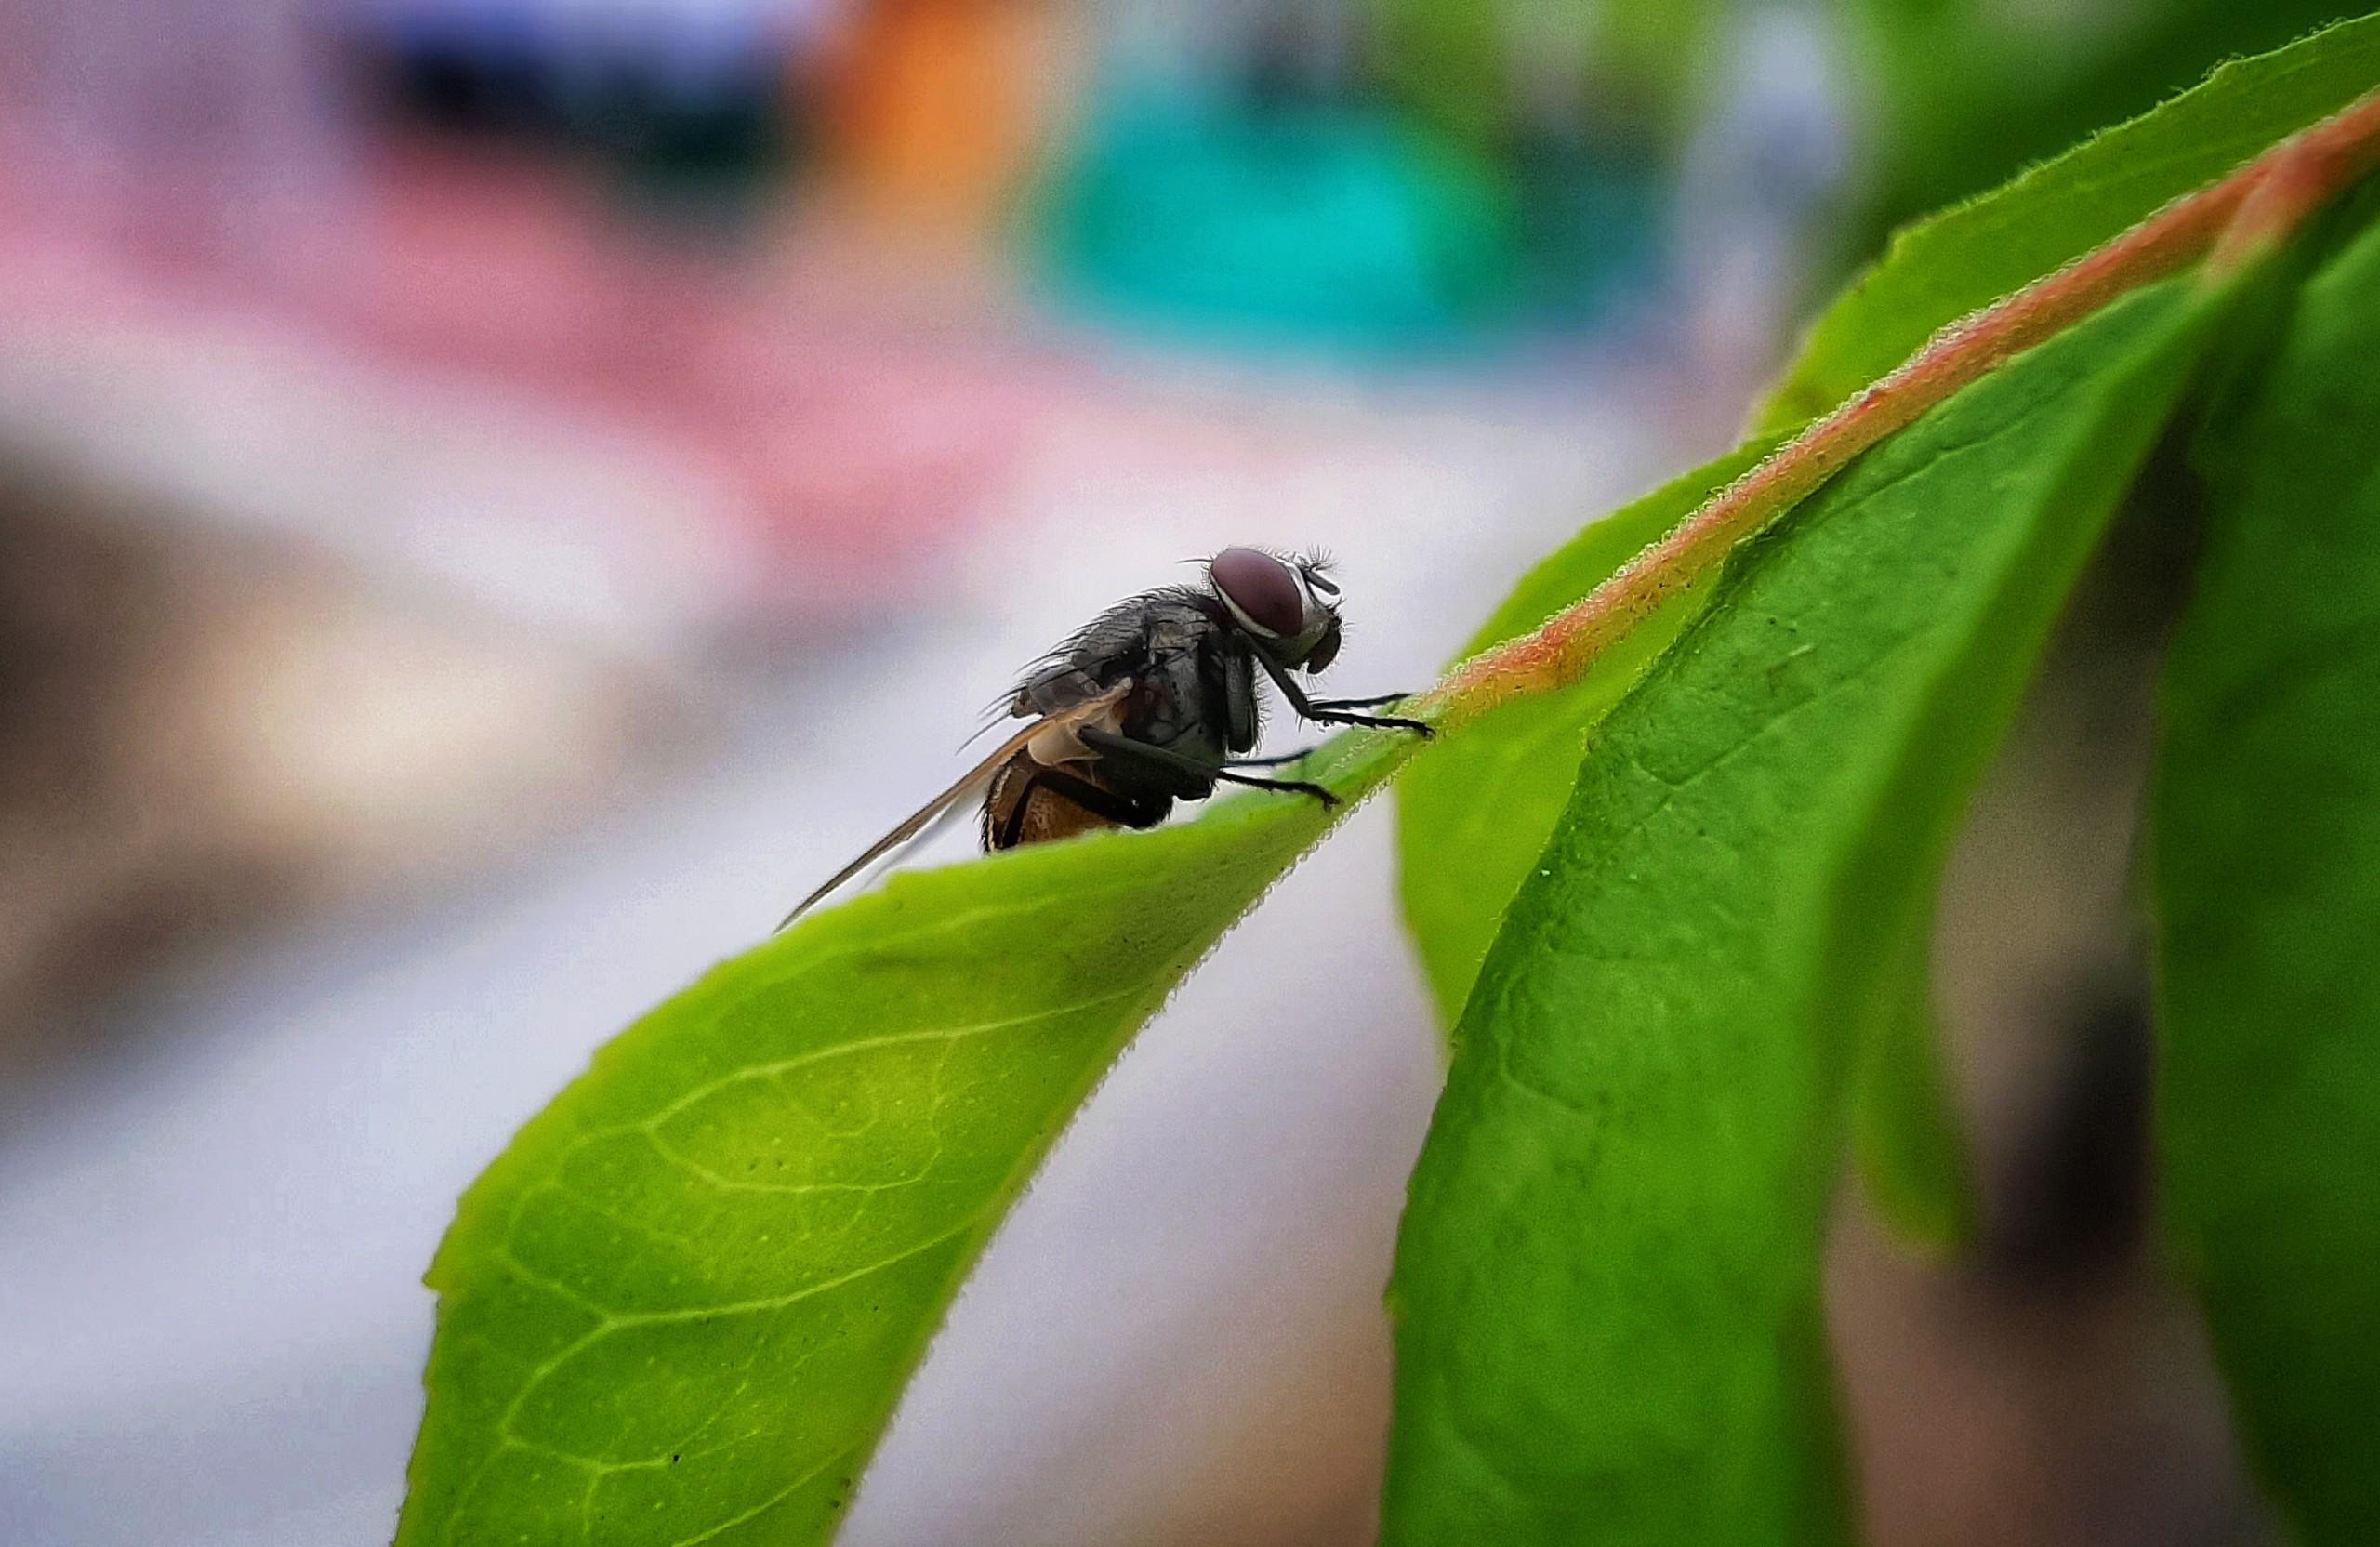 Housefly on Green Leaves